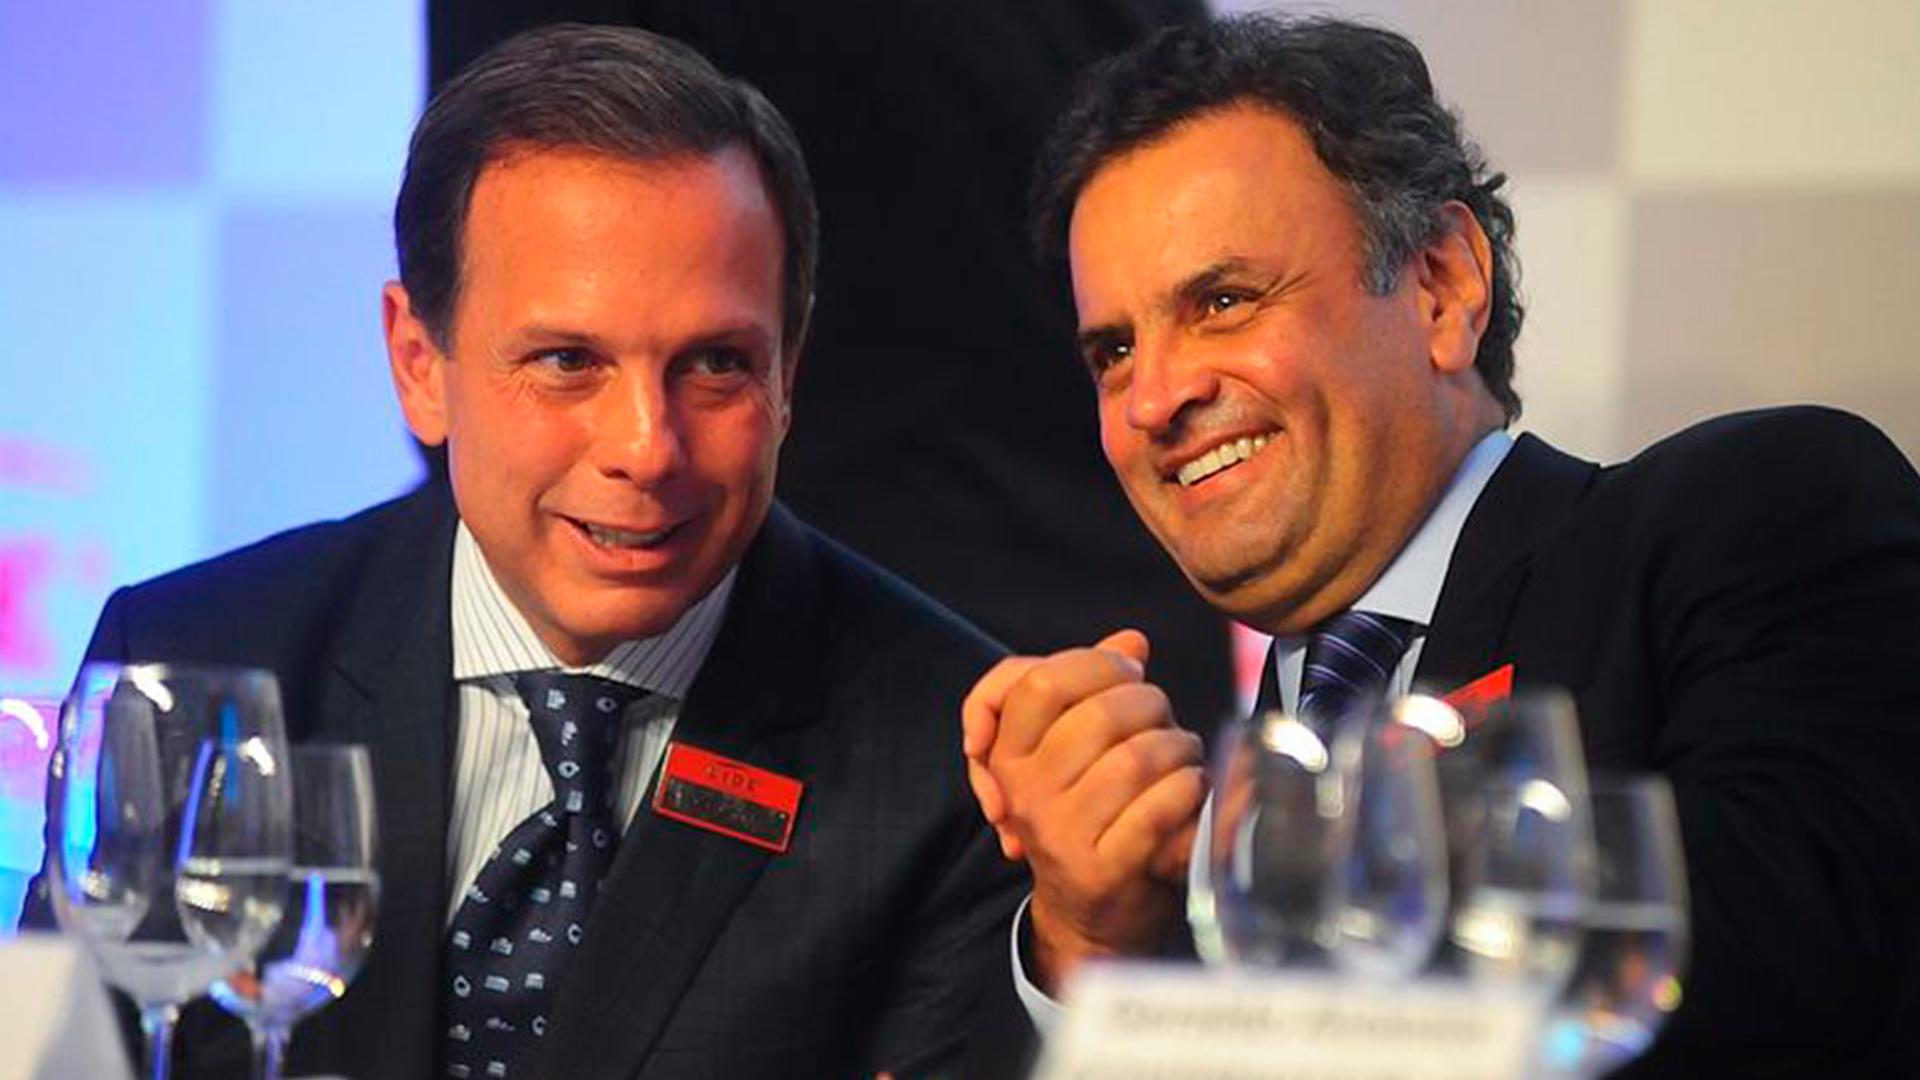 IMAGEM: Nem Lula, nem Bolsonaro, nem PSDB